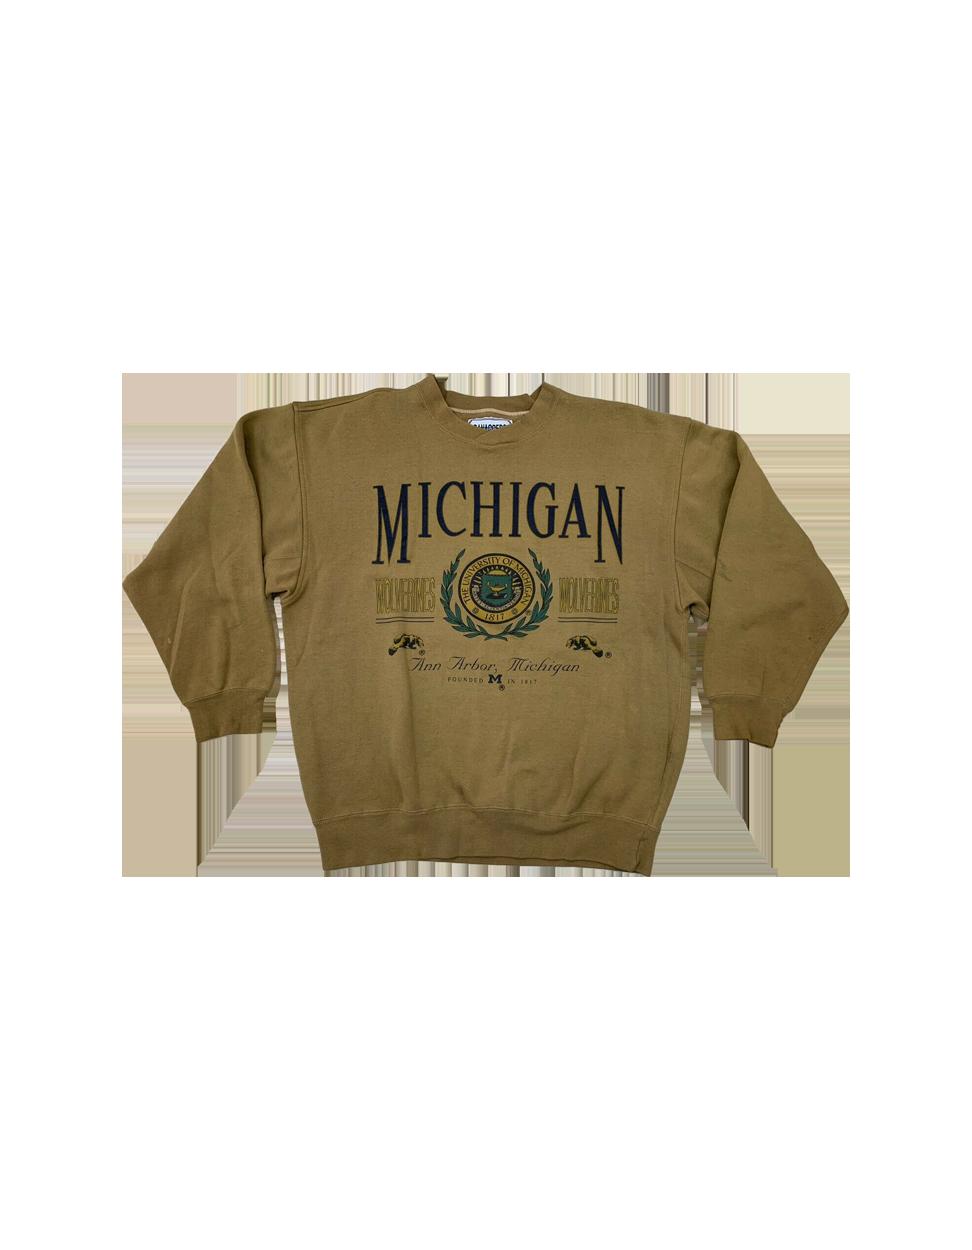 MICHIGAN University Sweatshirt